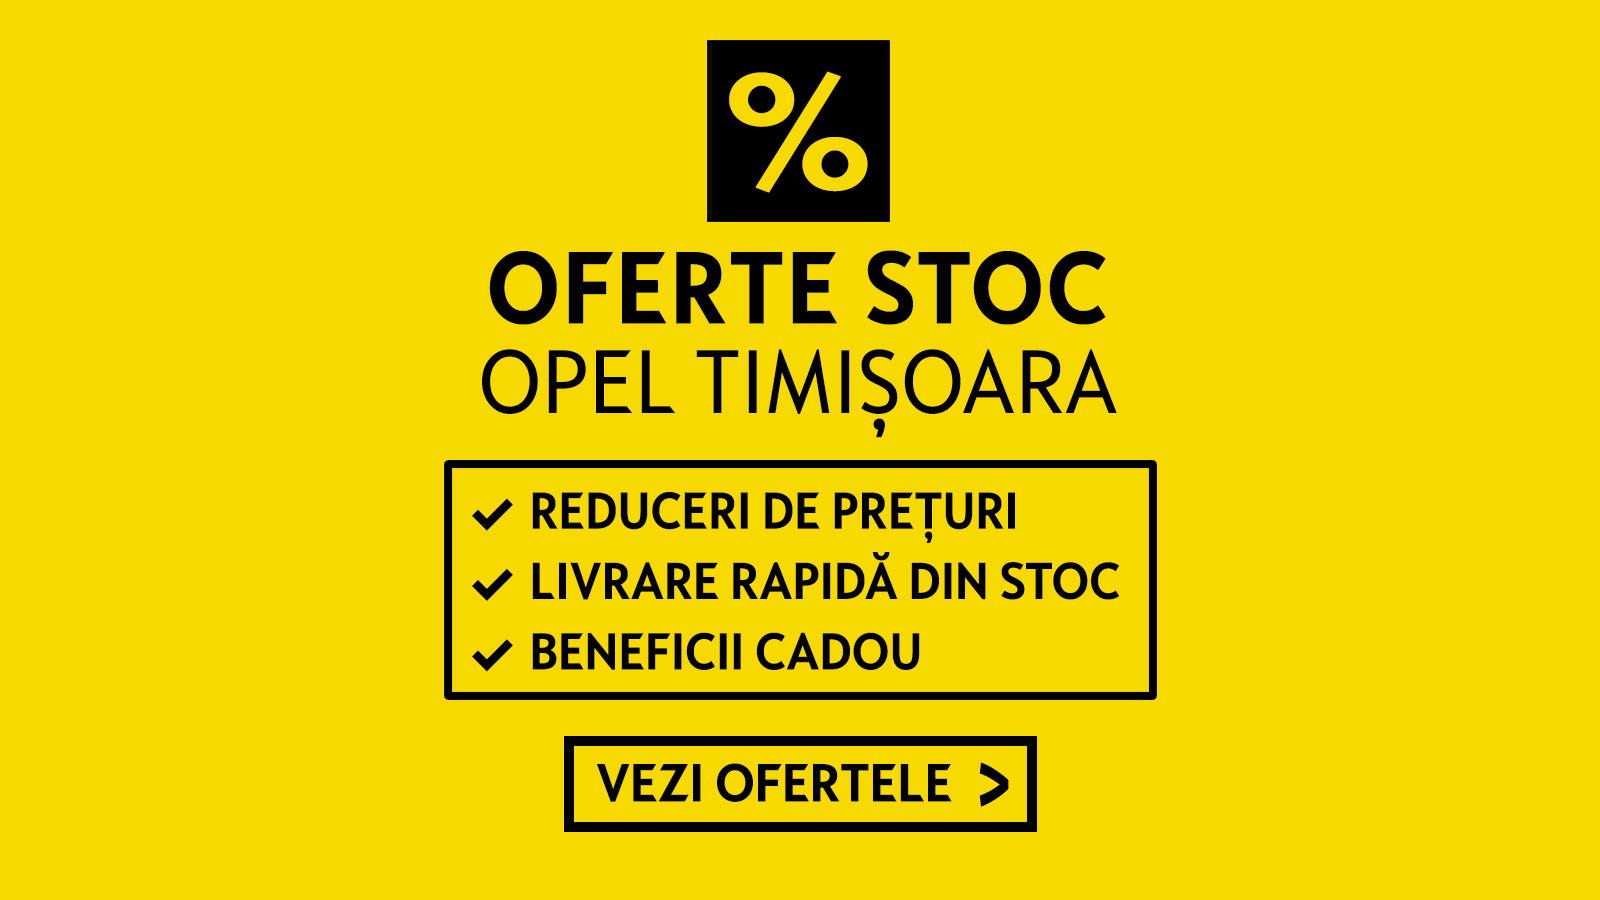 Oferte stoc Opel Timisoara